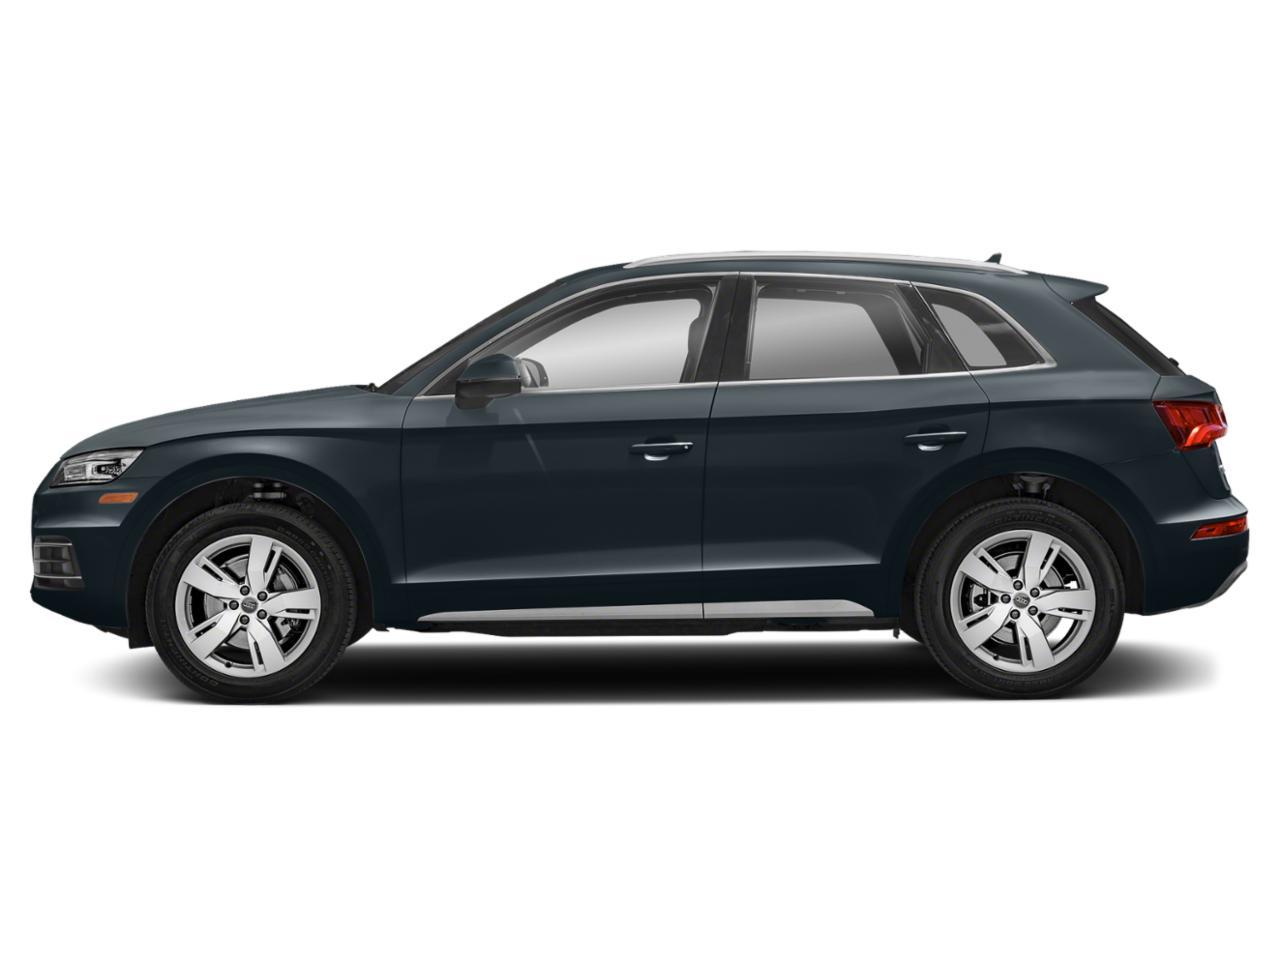 Used 2018 Audi Q5 Premium Plus with VIN WA1BNAFYXJ2214670 for sale in Brooklyn Center, Minnesota